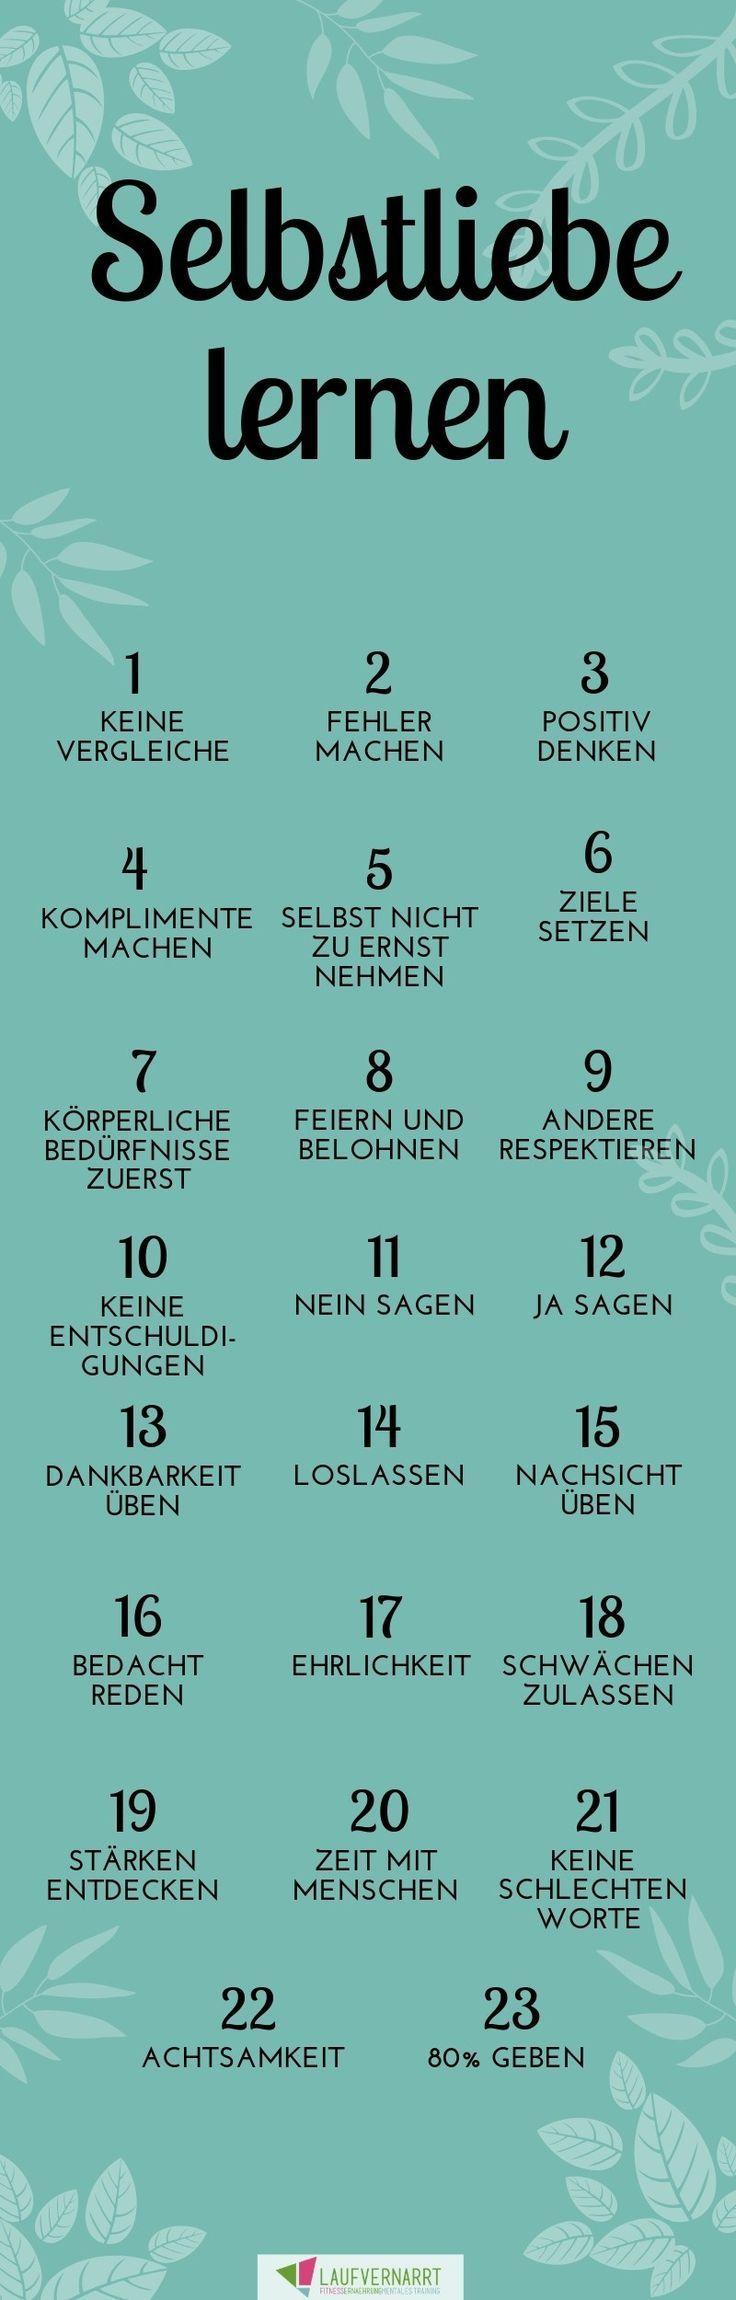 Die Selbstliebe - ein kompletter Guide in 23 Punkten #la